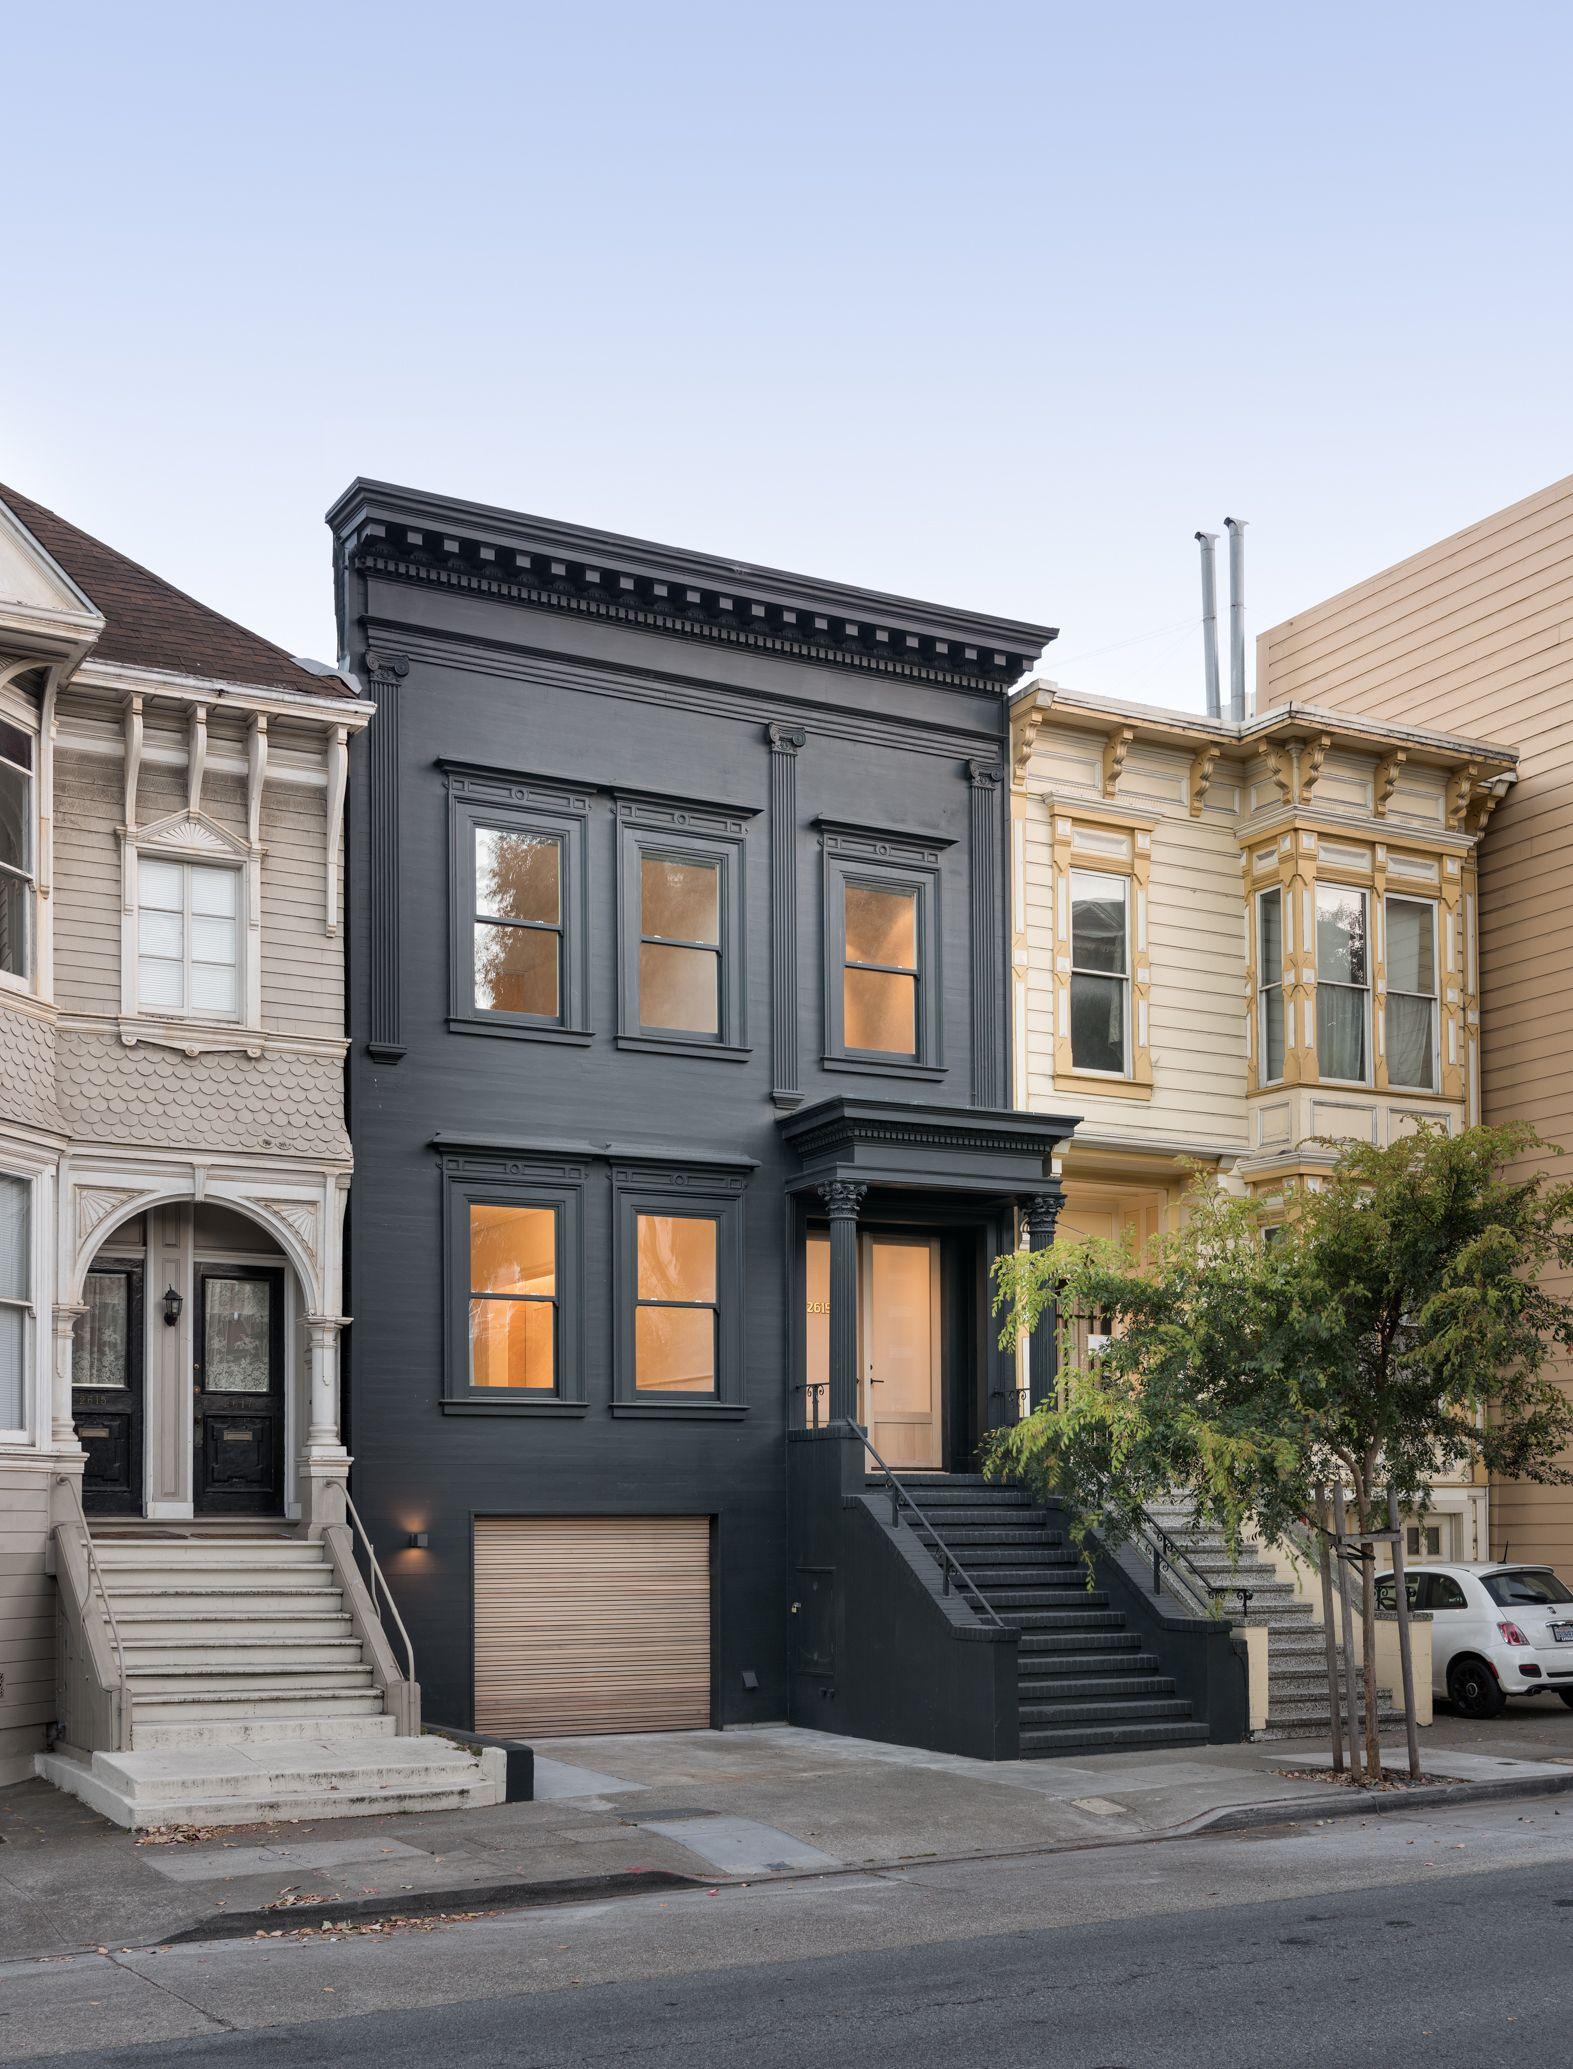 Modern Townhouse Townhouse Designs San Francisco: Pine Street Home Remodel – Modern Luxury Design